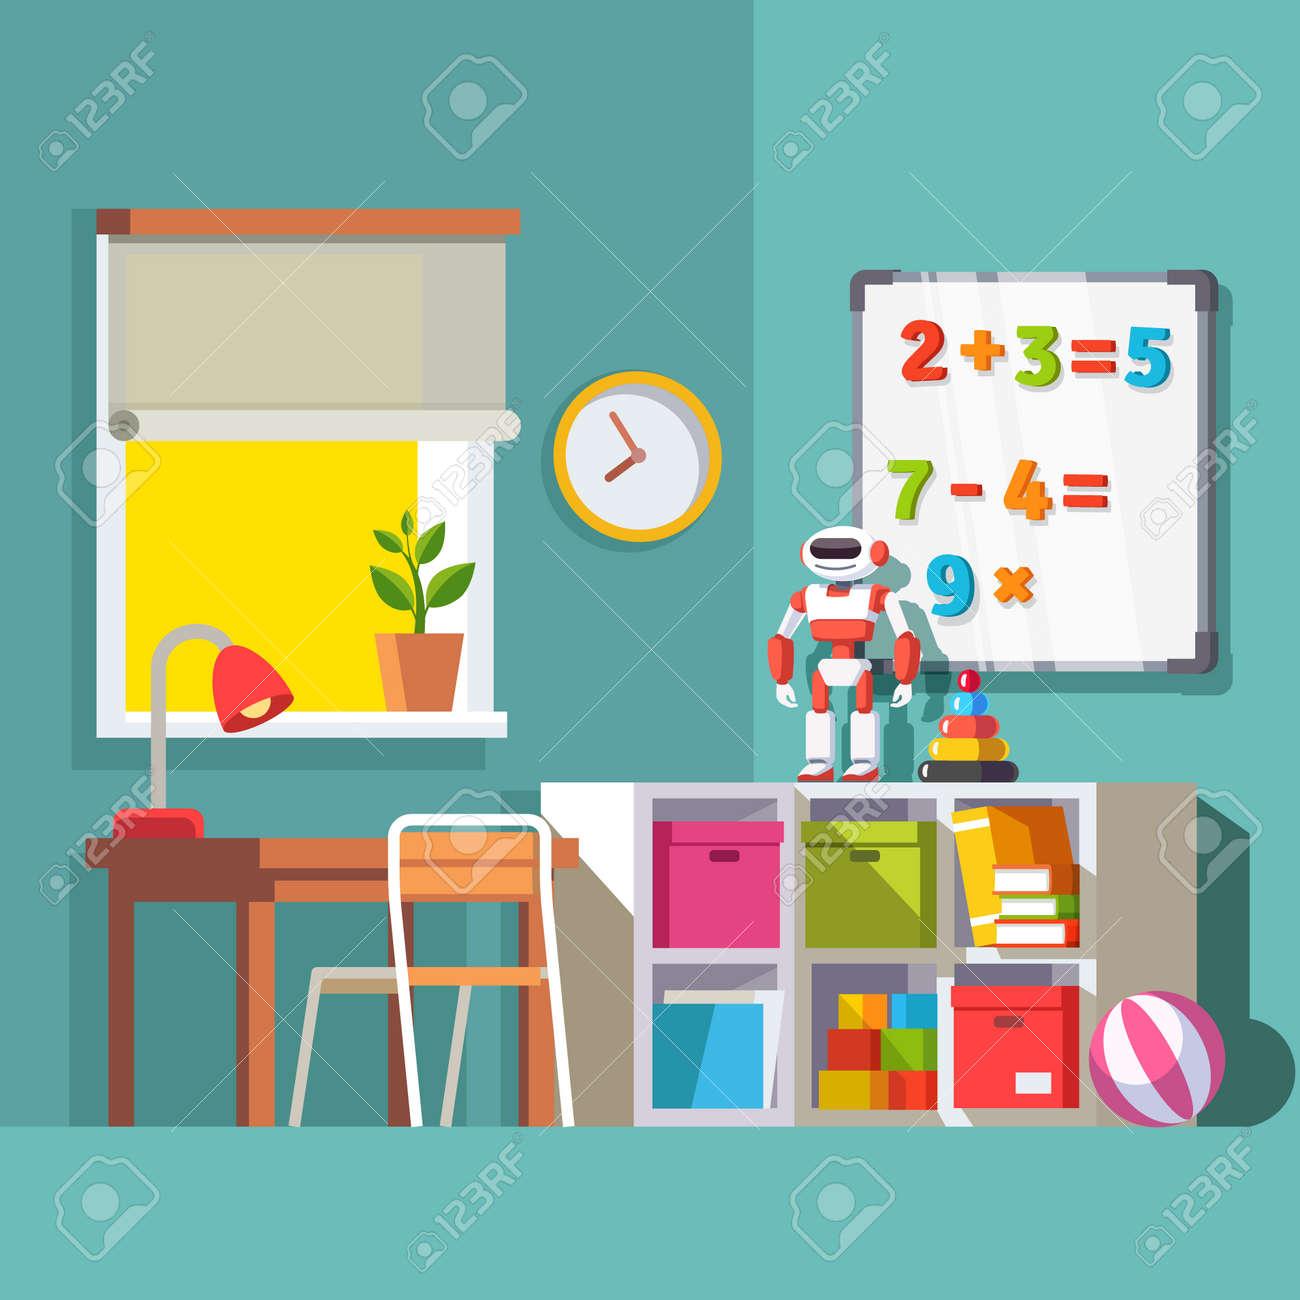 School Window Clipart preschool or school student kid room interior. study desk at